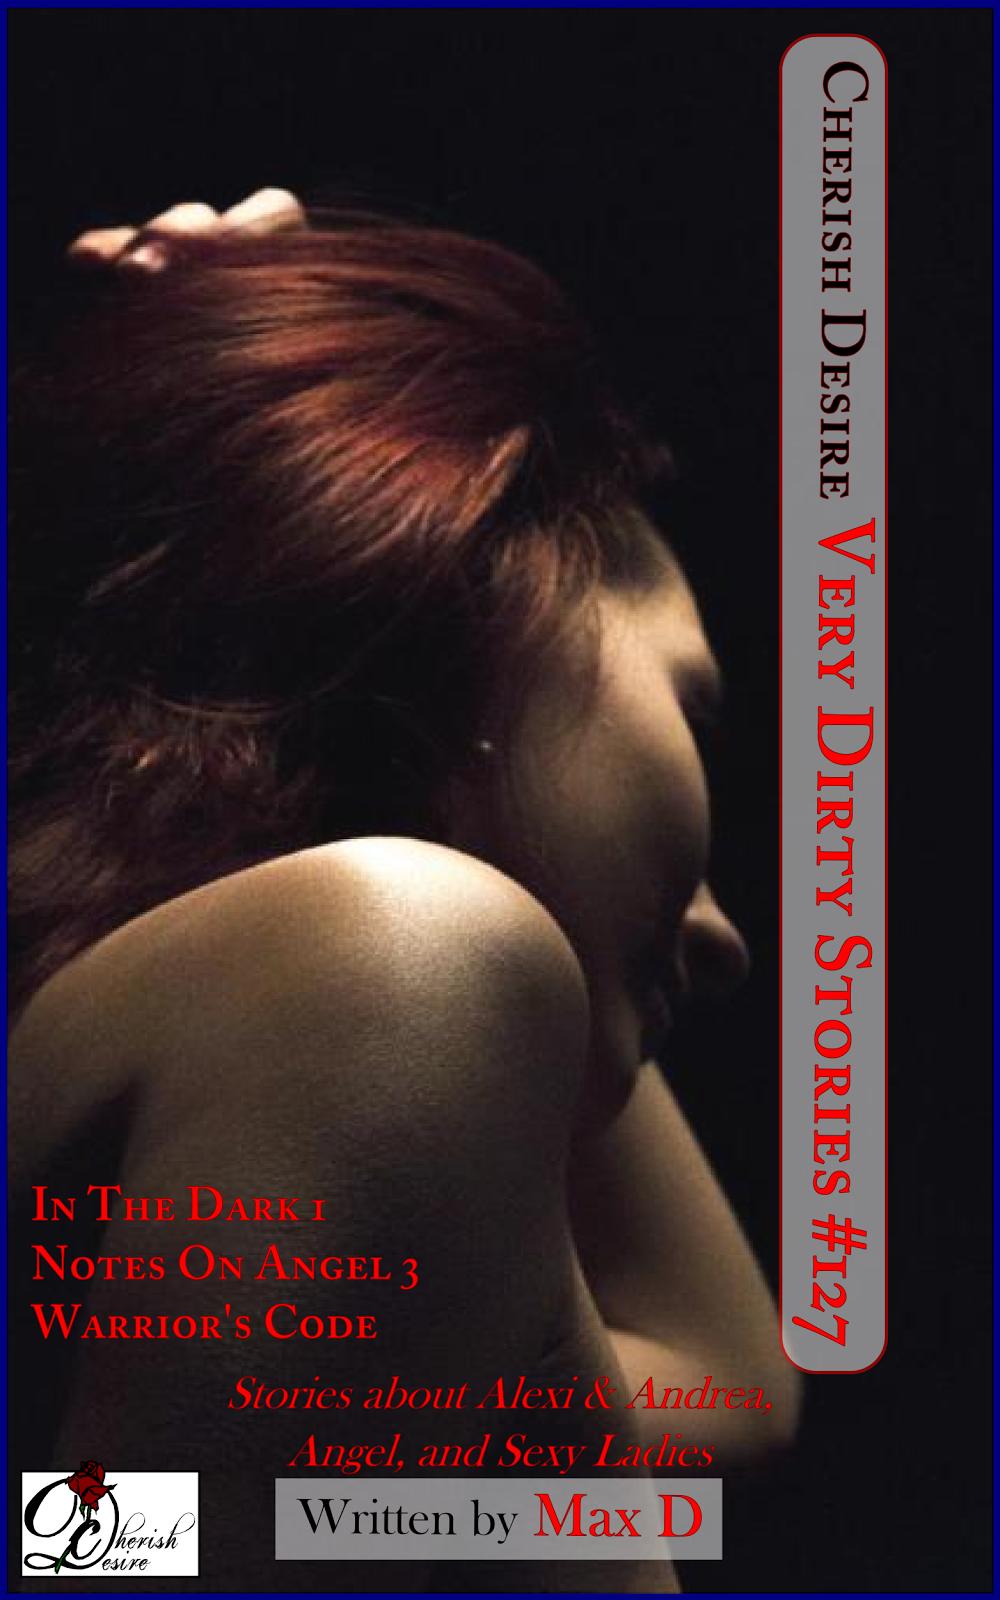 Cherish Desire: Very Dirty Stories #127, Max D, erotica